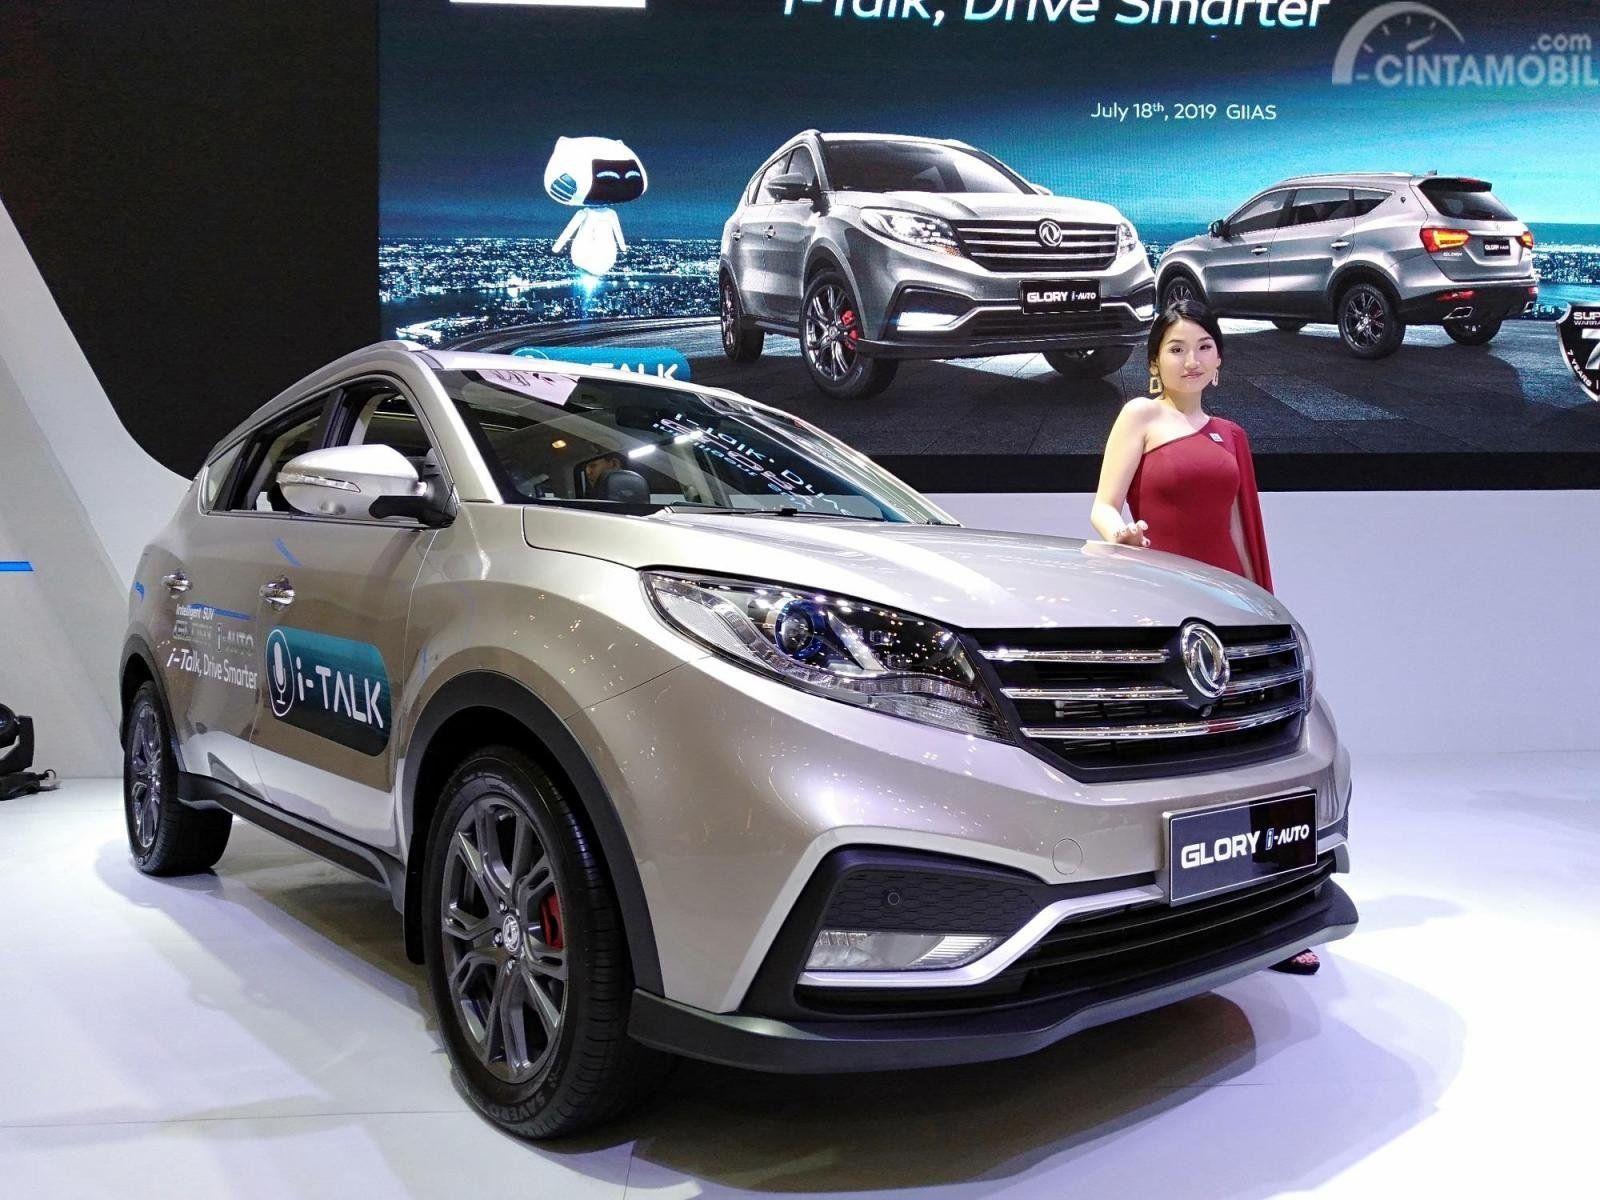 Review Dfsk Glory I Auto 2020 Suv Kaya Fitur Terbaru Dfsk Suv Mobil Indonesia